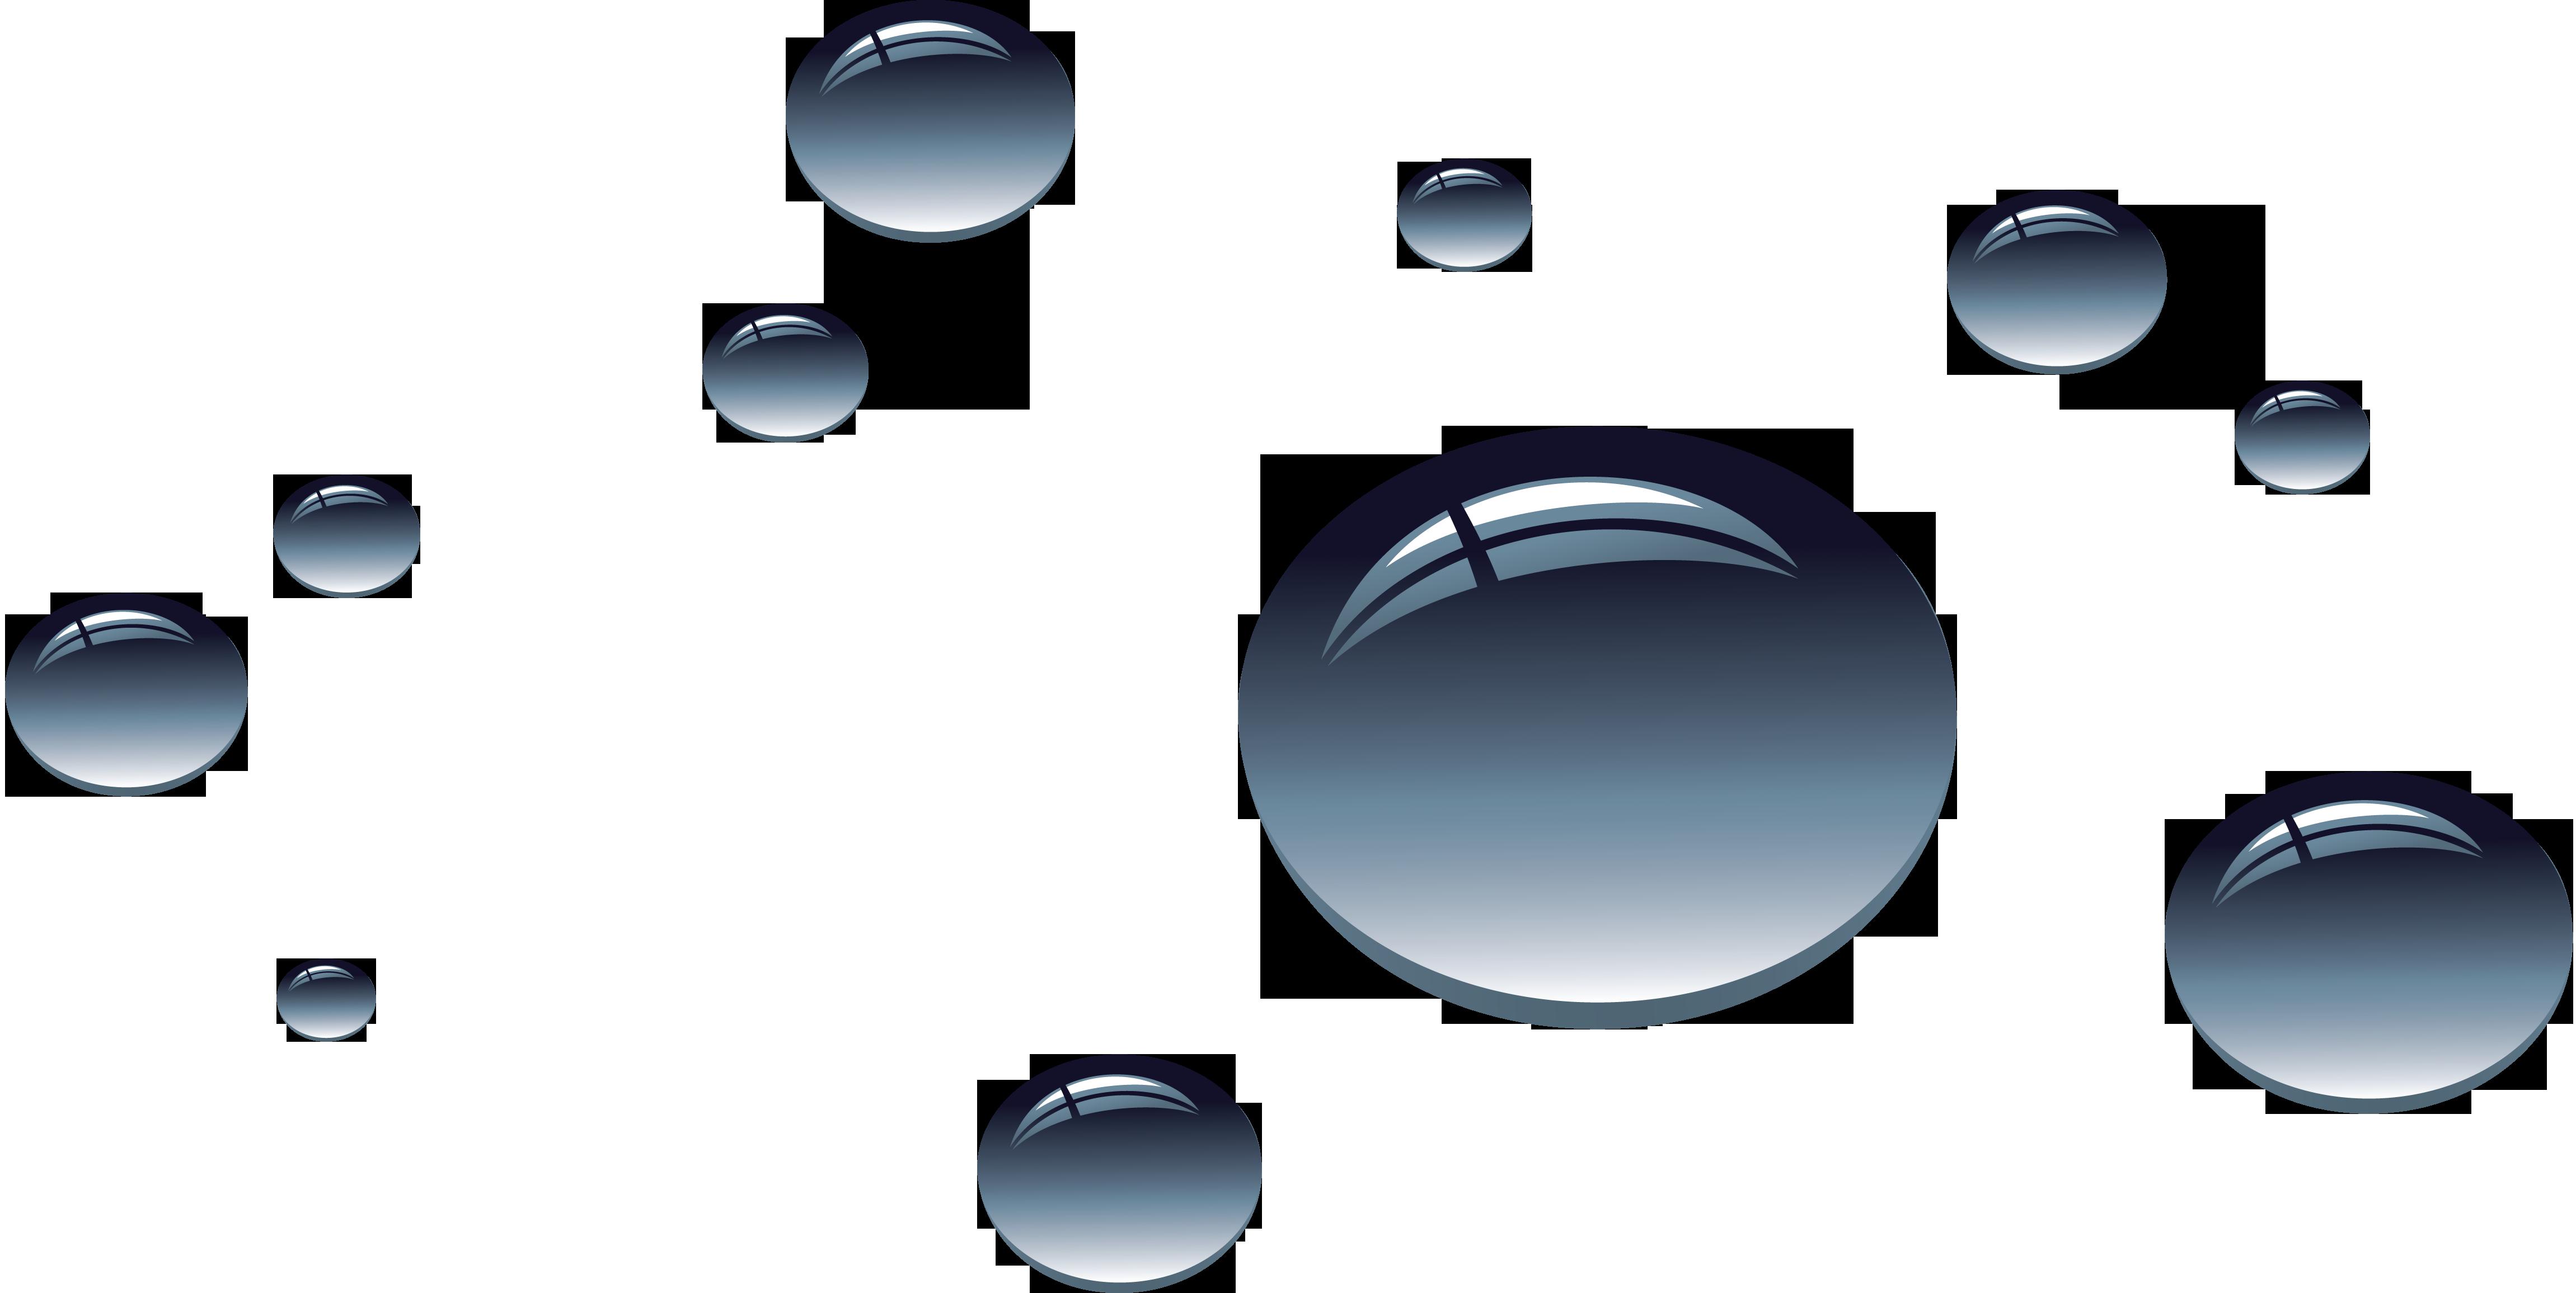 Drops png image . Evaporation clipart water drop